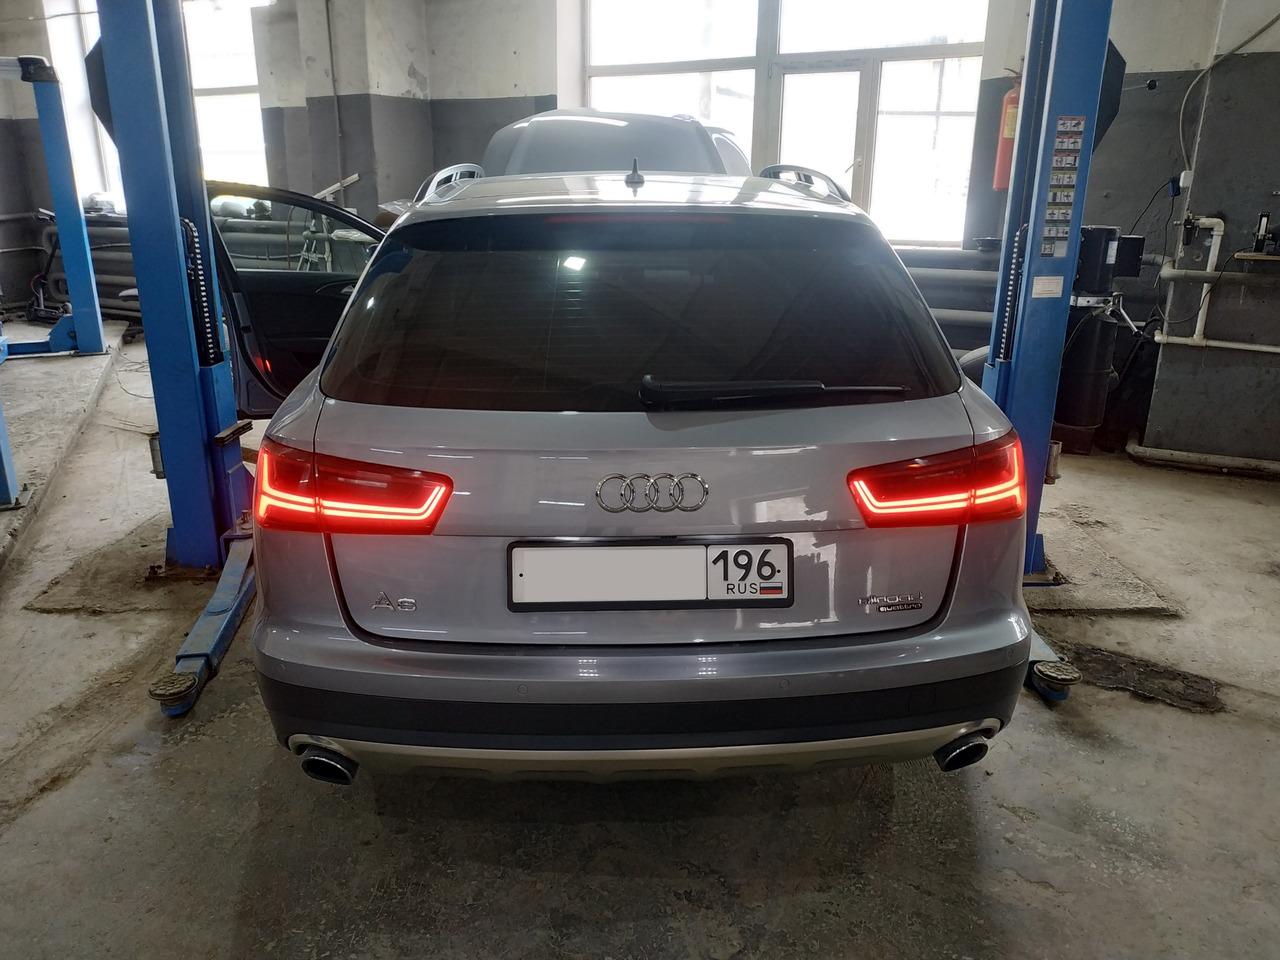 Audi A6 Allroad Quattro, вид сзади